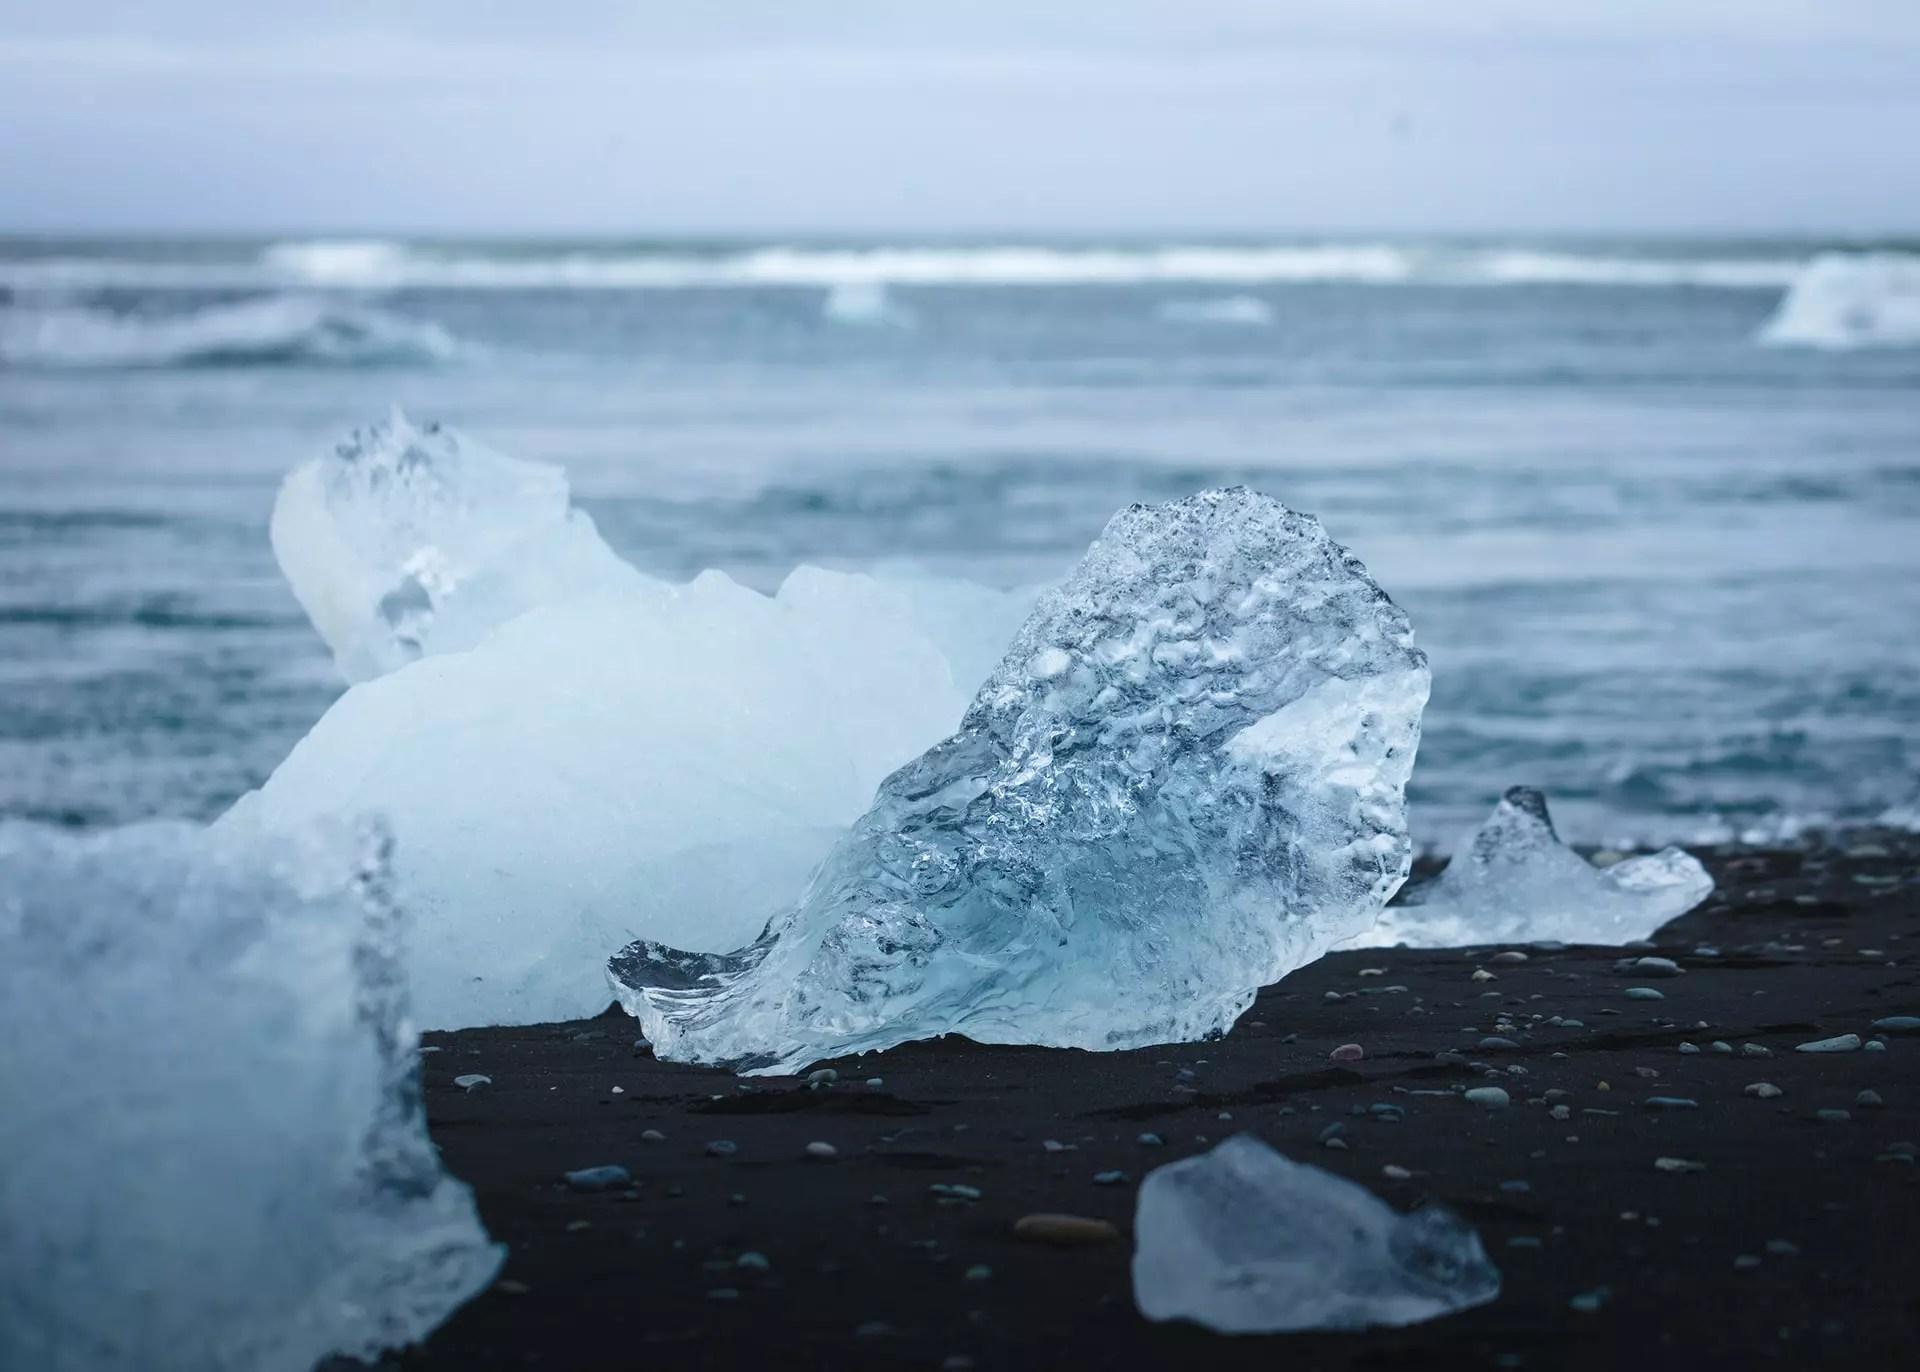 Iceland's natural wonders